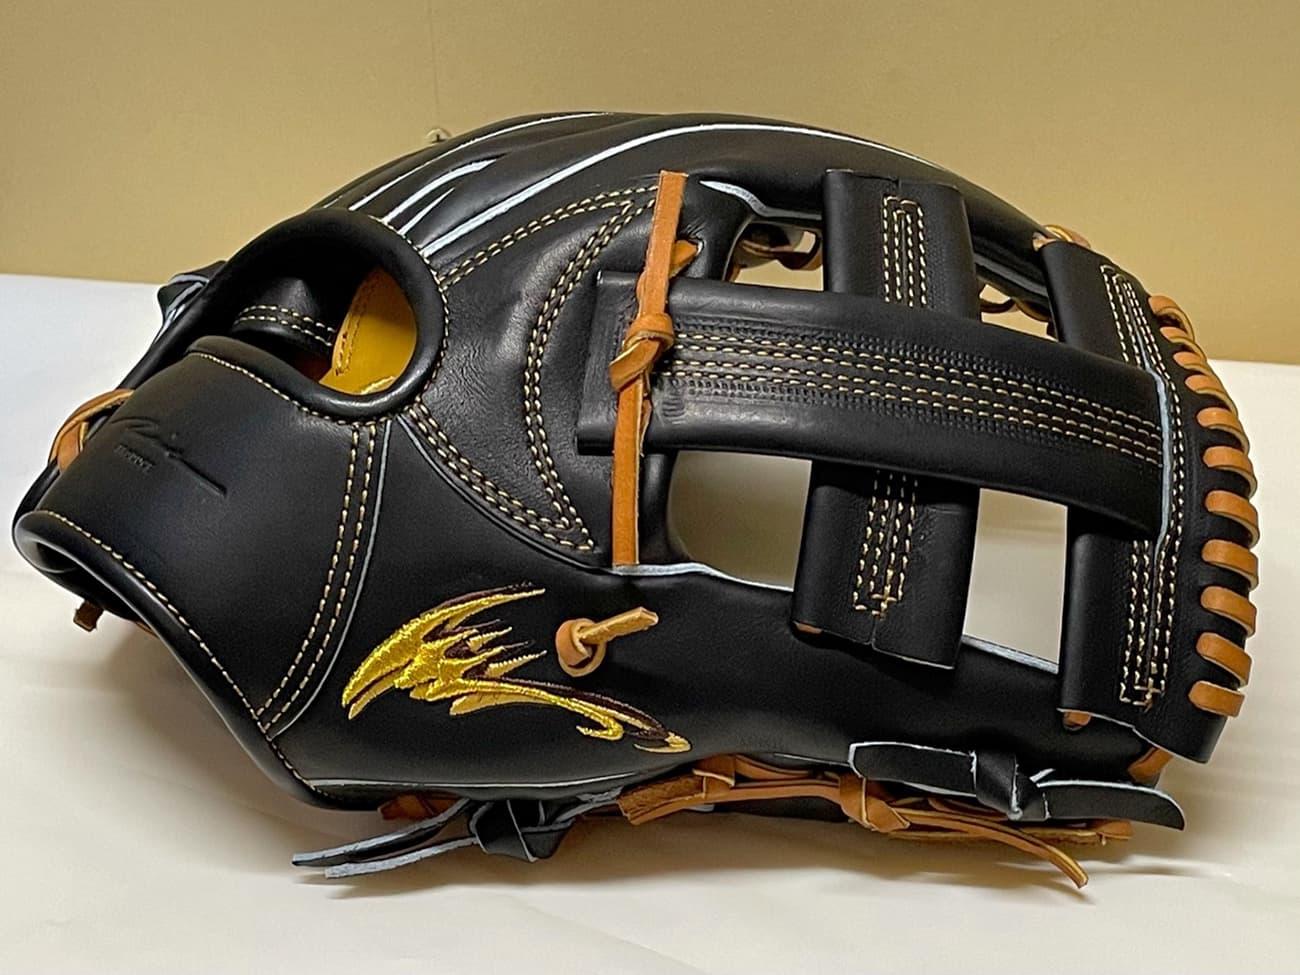 【IPセレクト】【十河モデル】硬式野球用グラブ(内野手・Luxury Collection 限定)側面